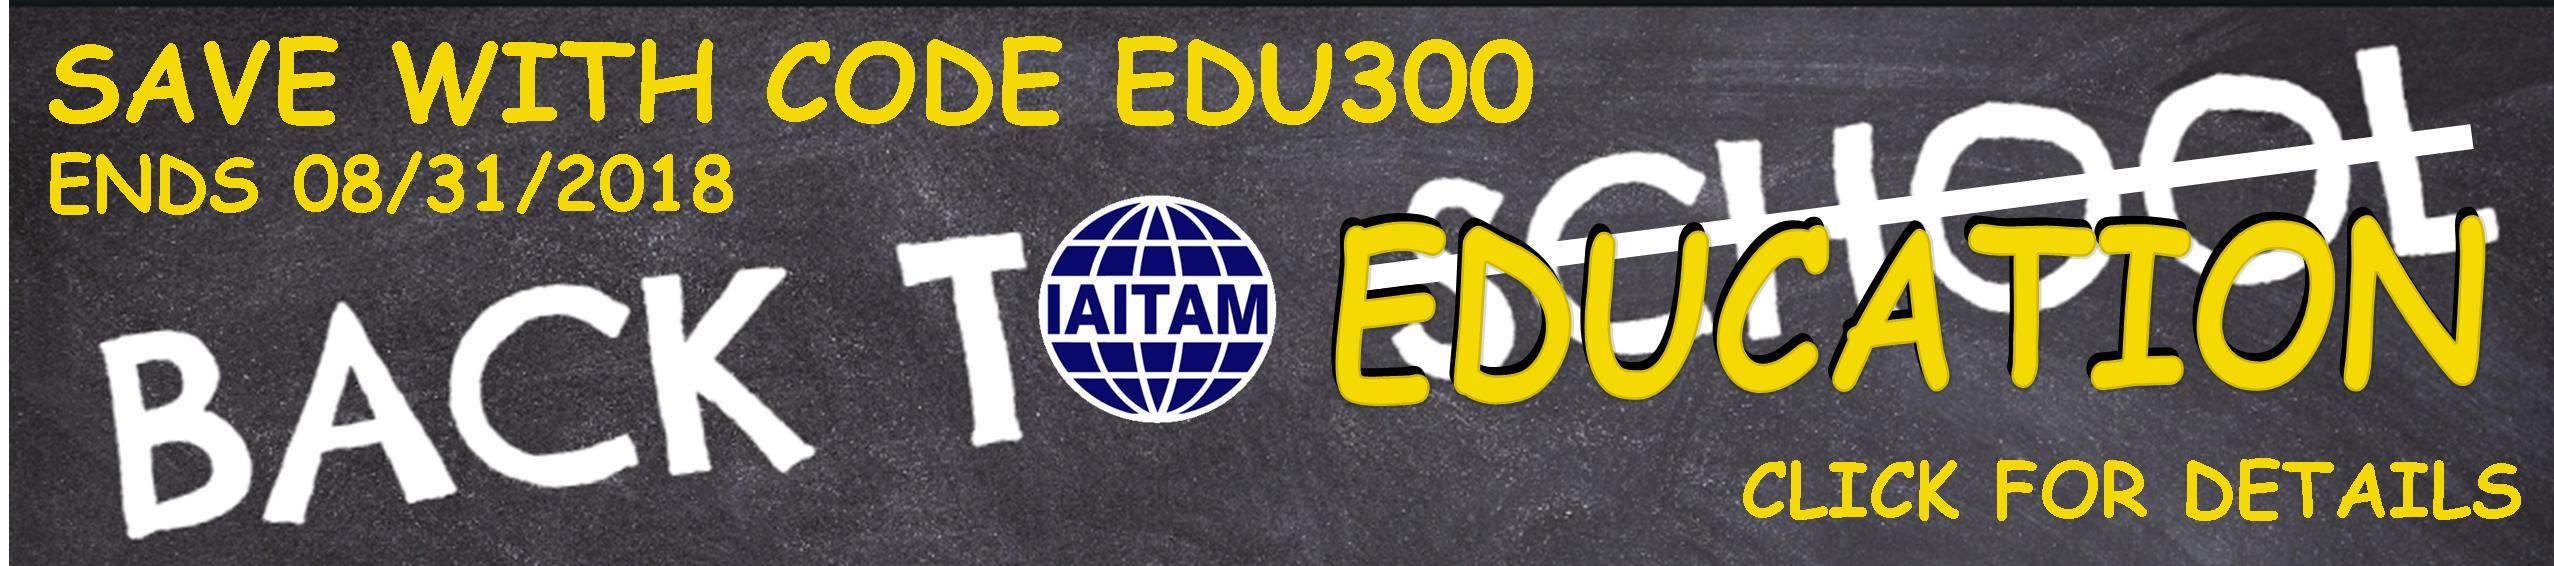 EDU300 Special